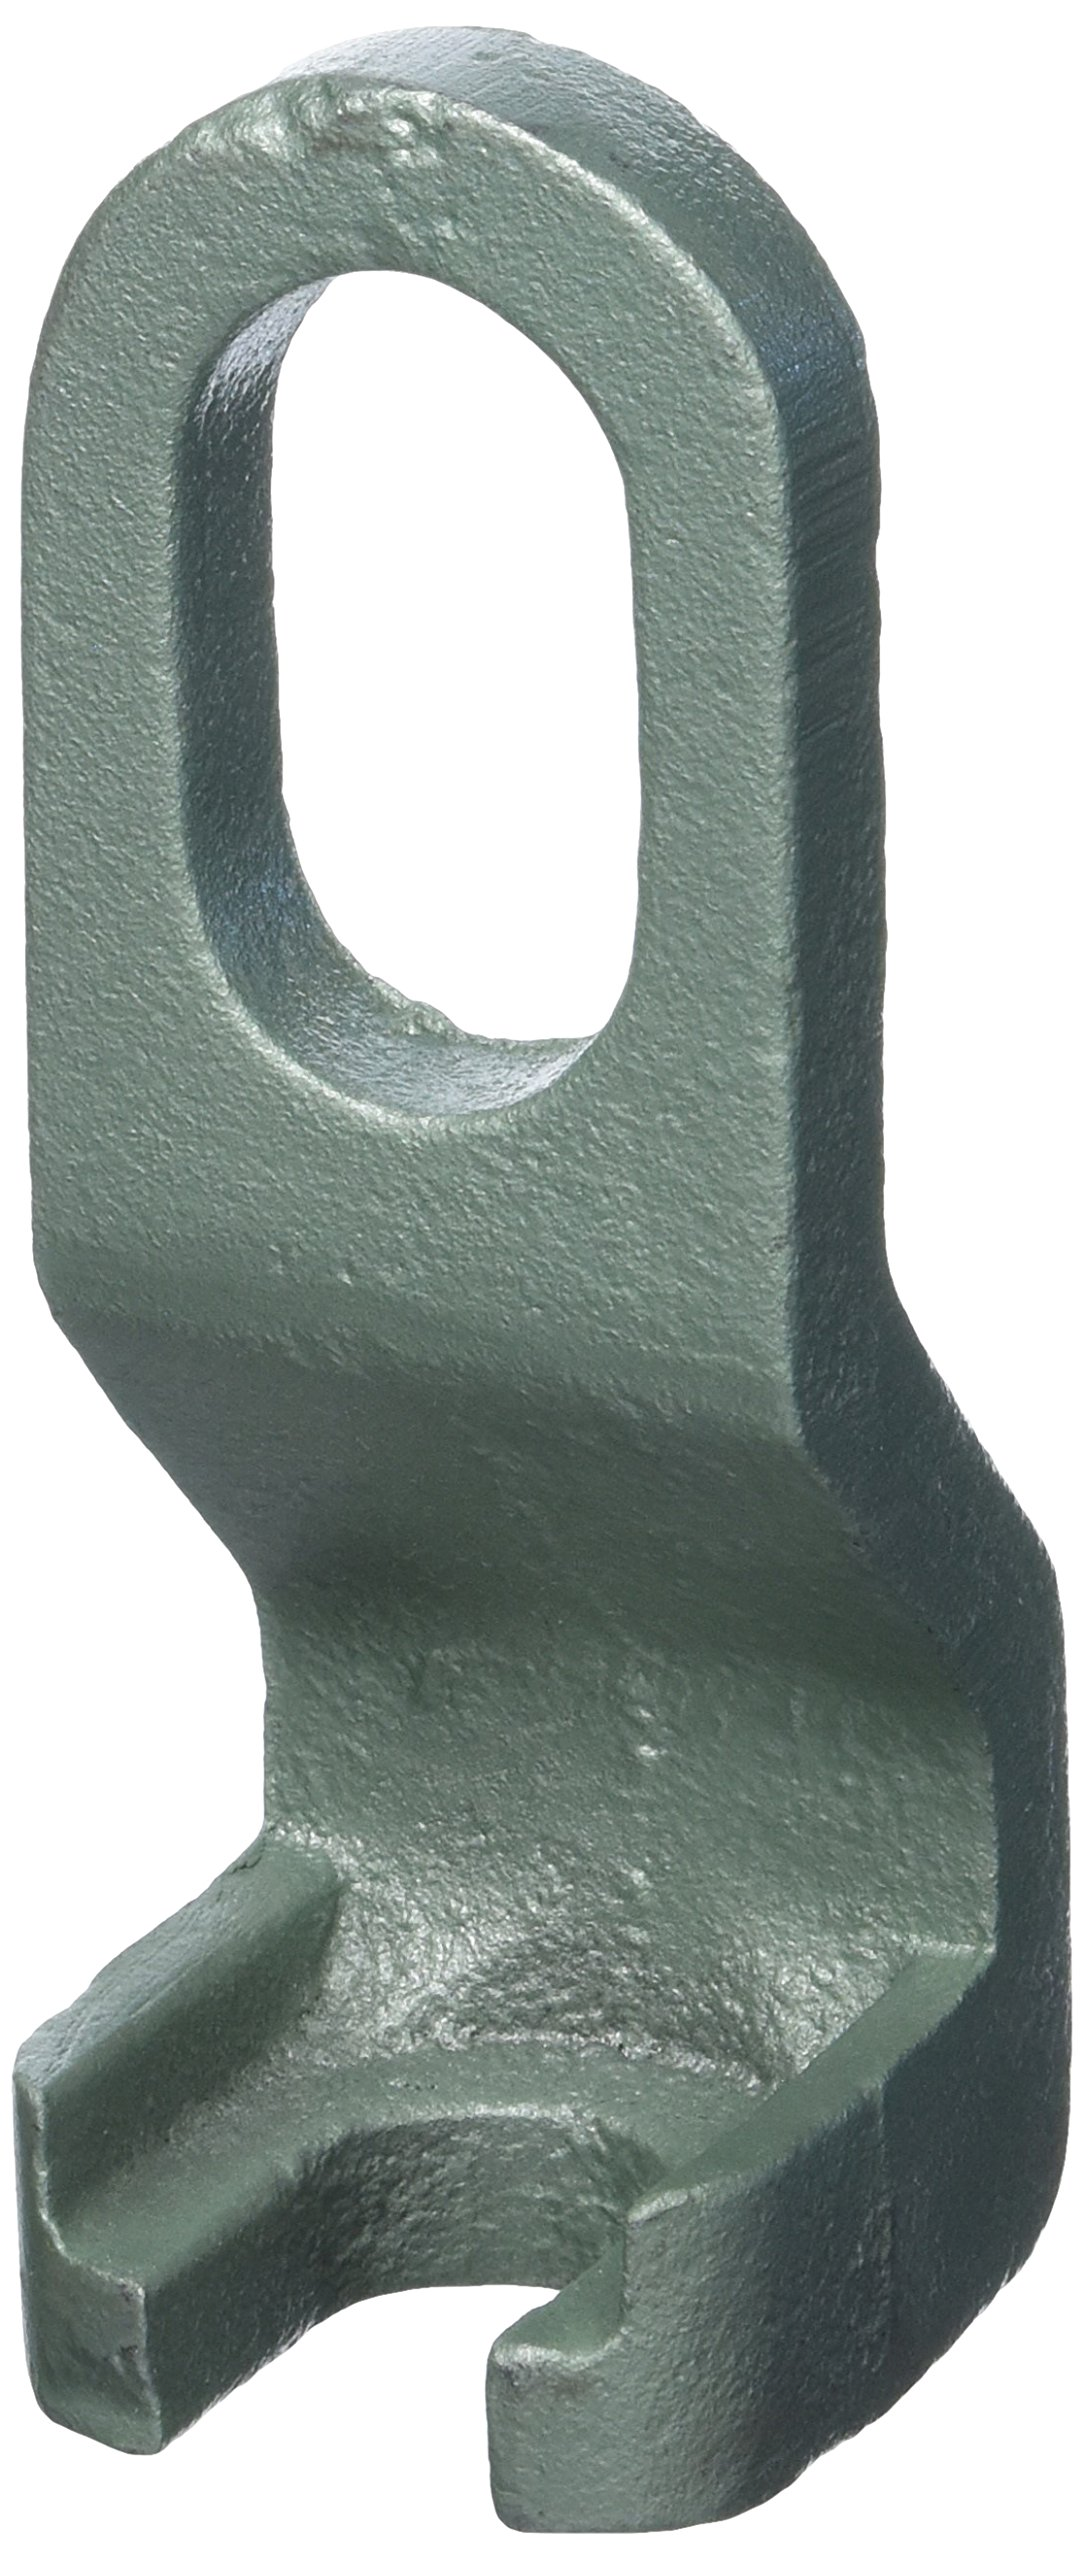 Mo-Clamp MOC1340 Bolt Puller